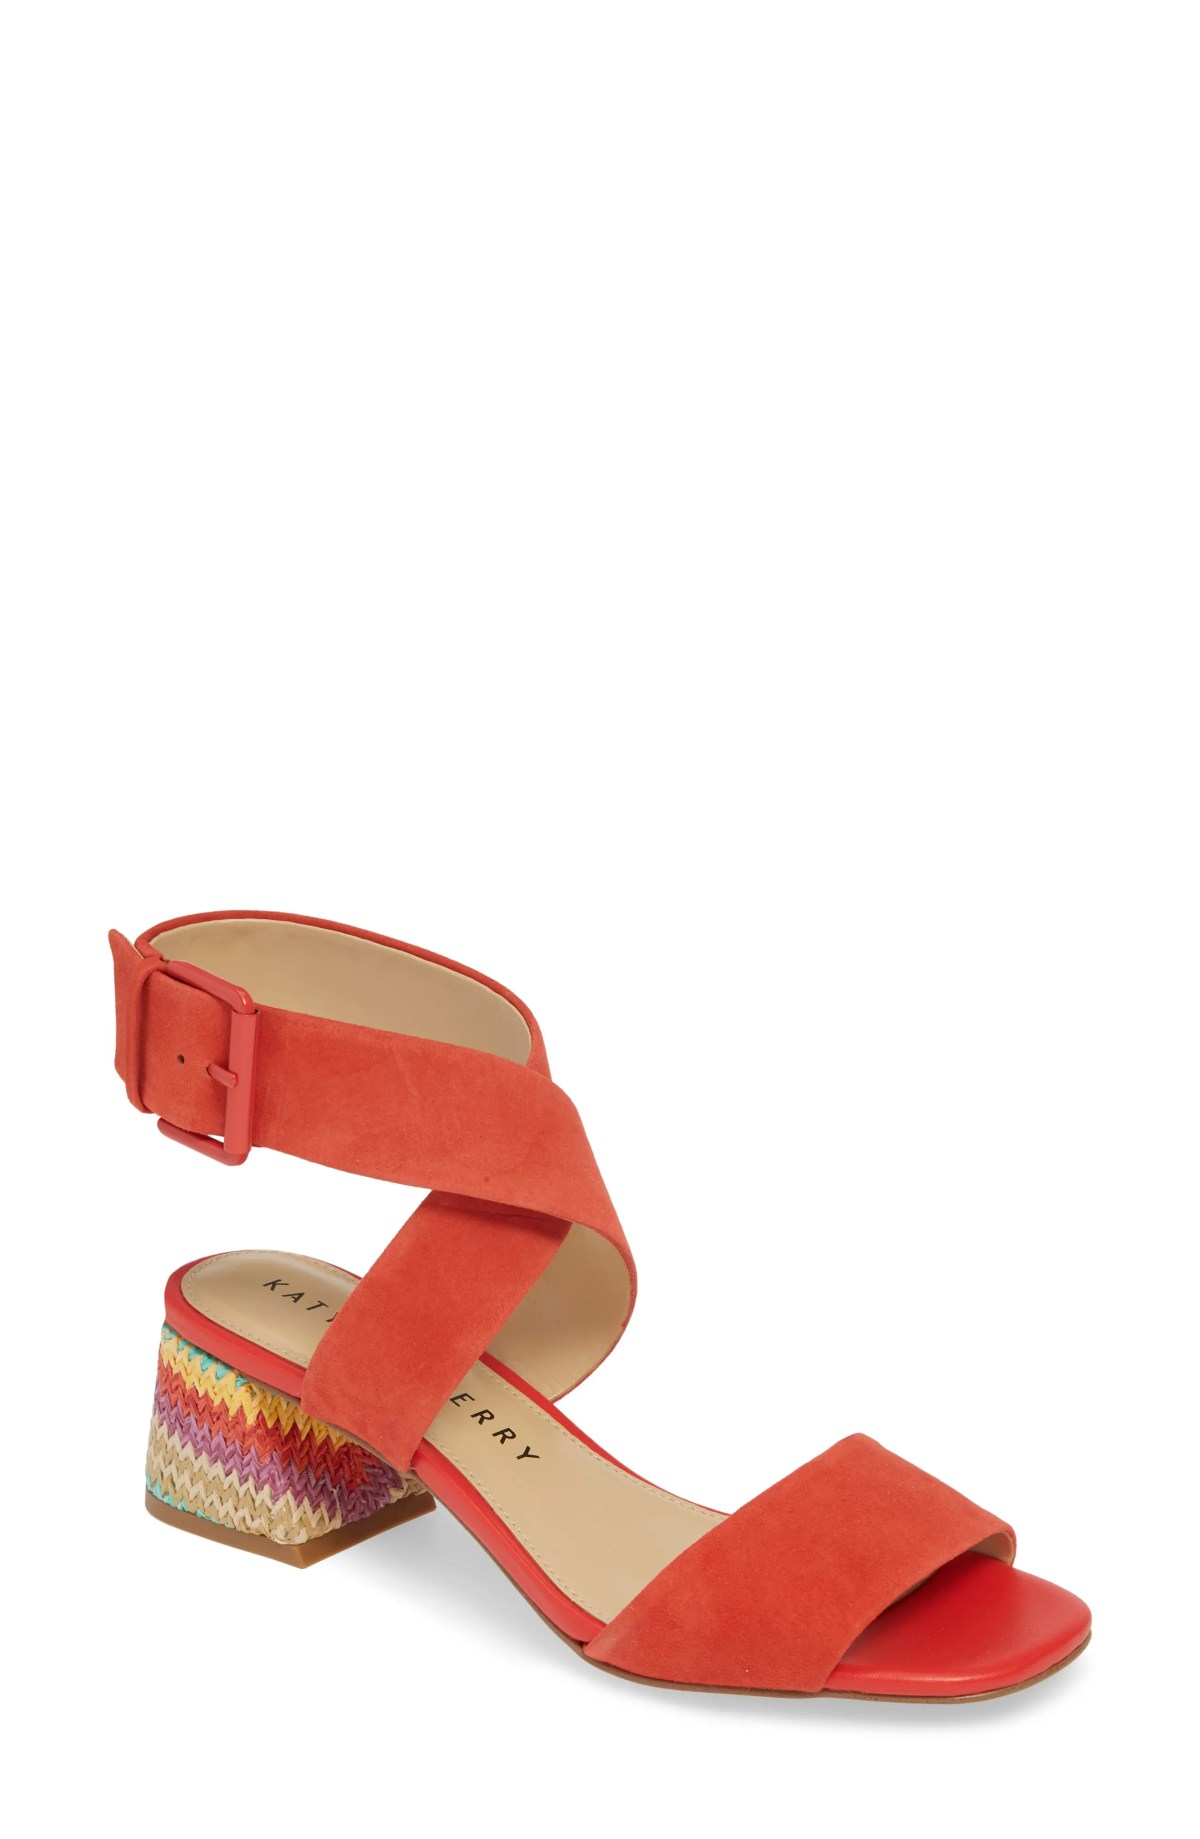 KATY PERRY Albee Sandal, Main, color, SCARLET